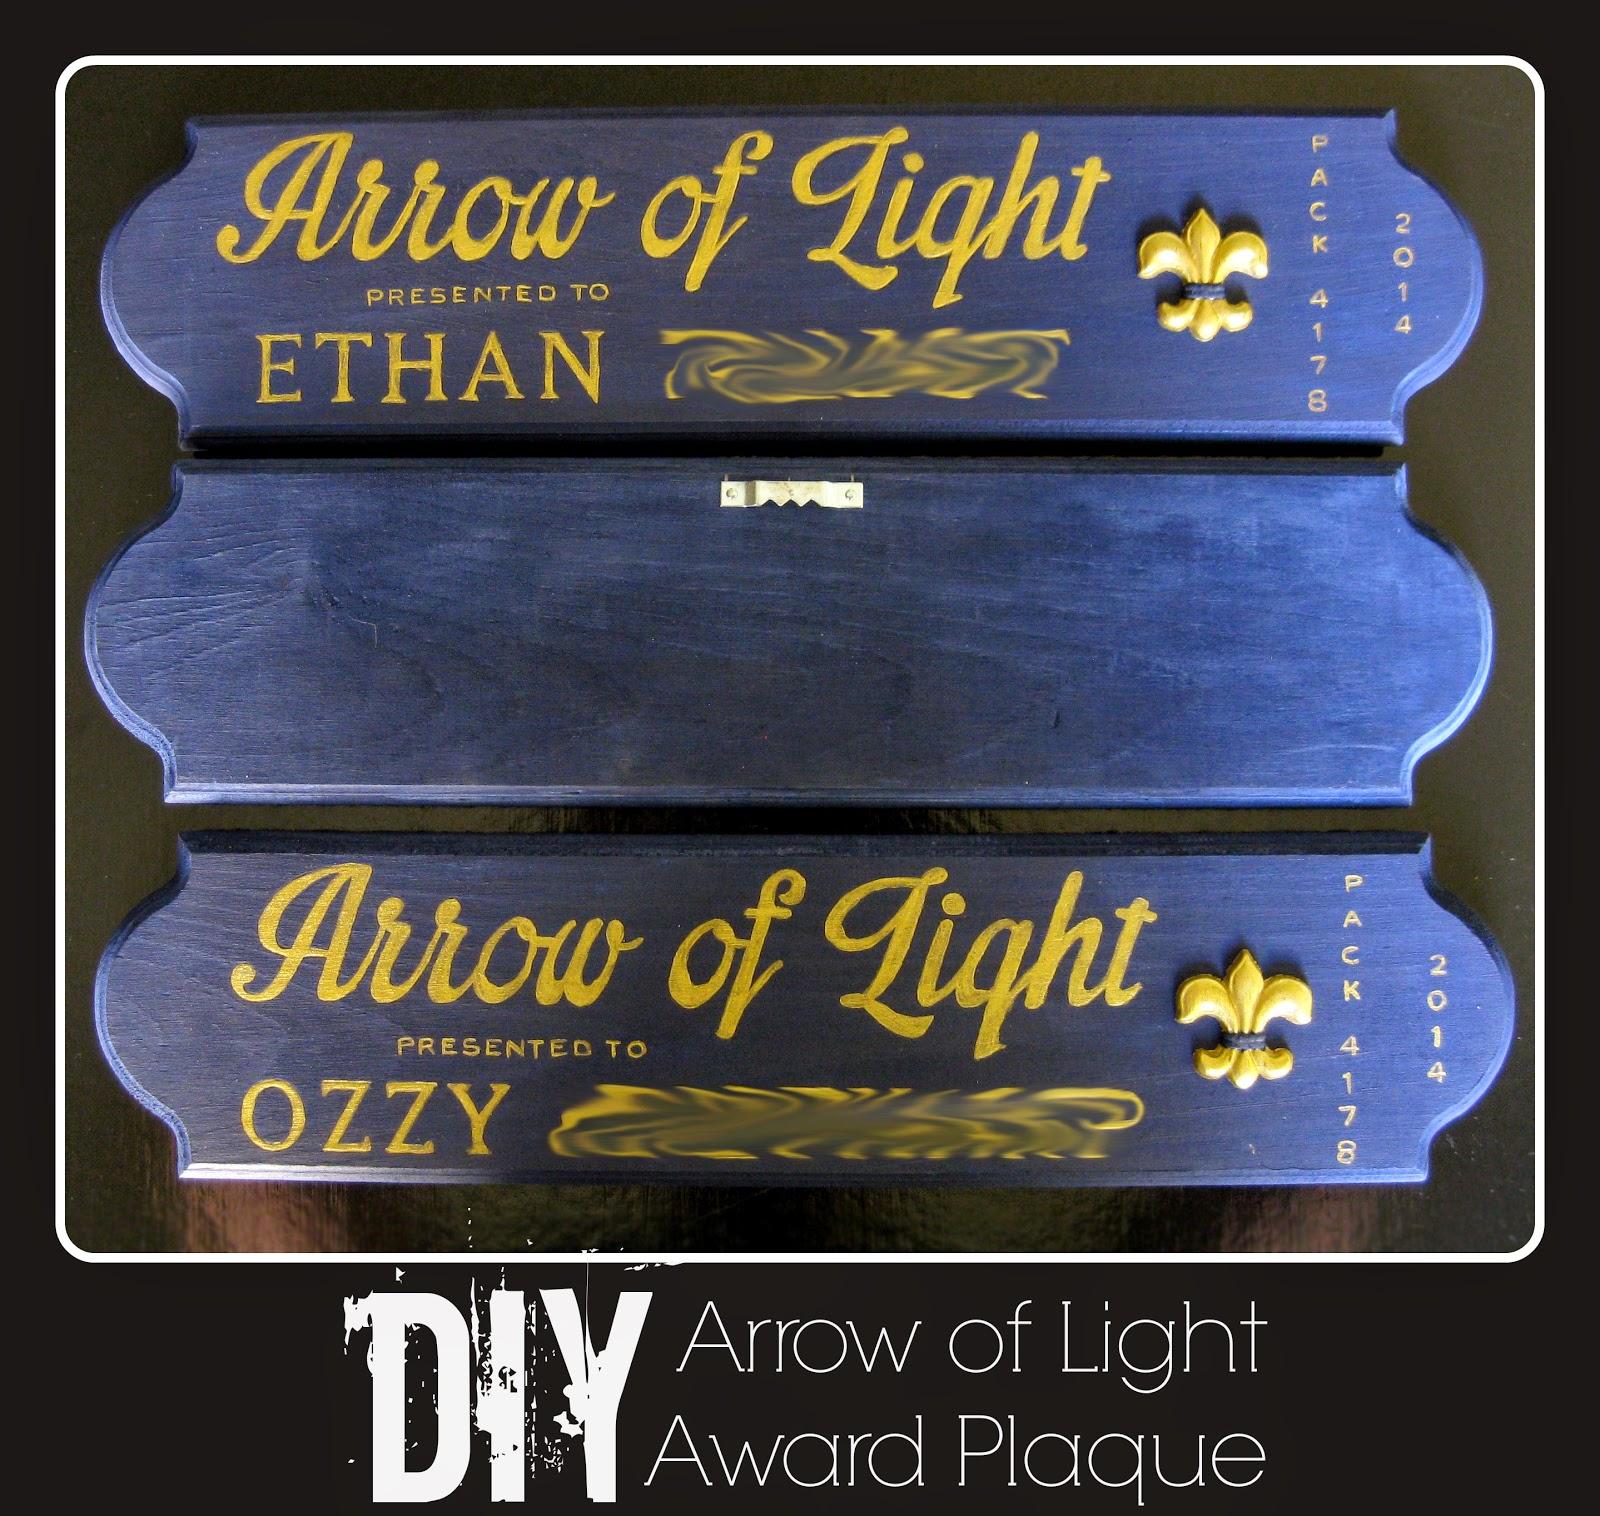 arrow of light plaque with arrow.html